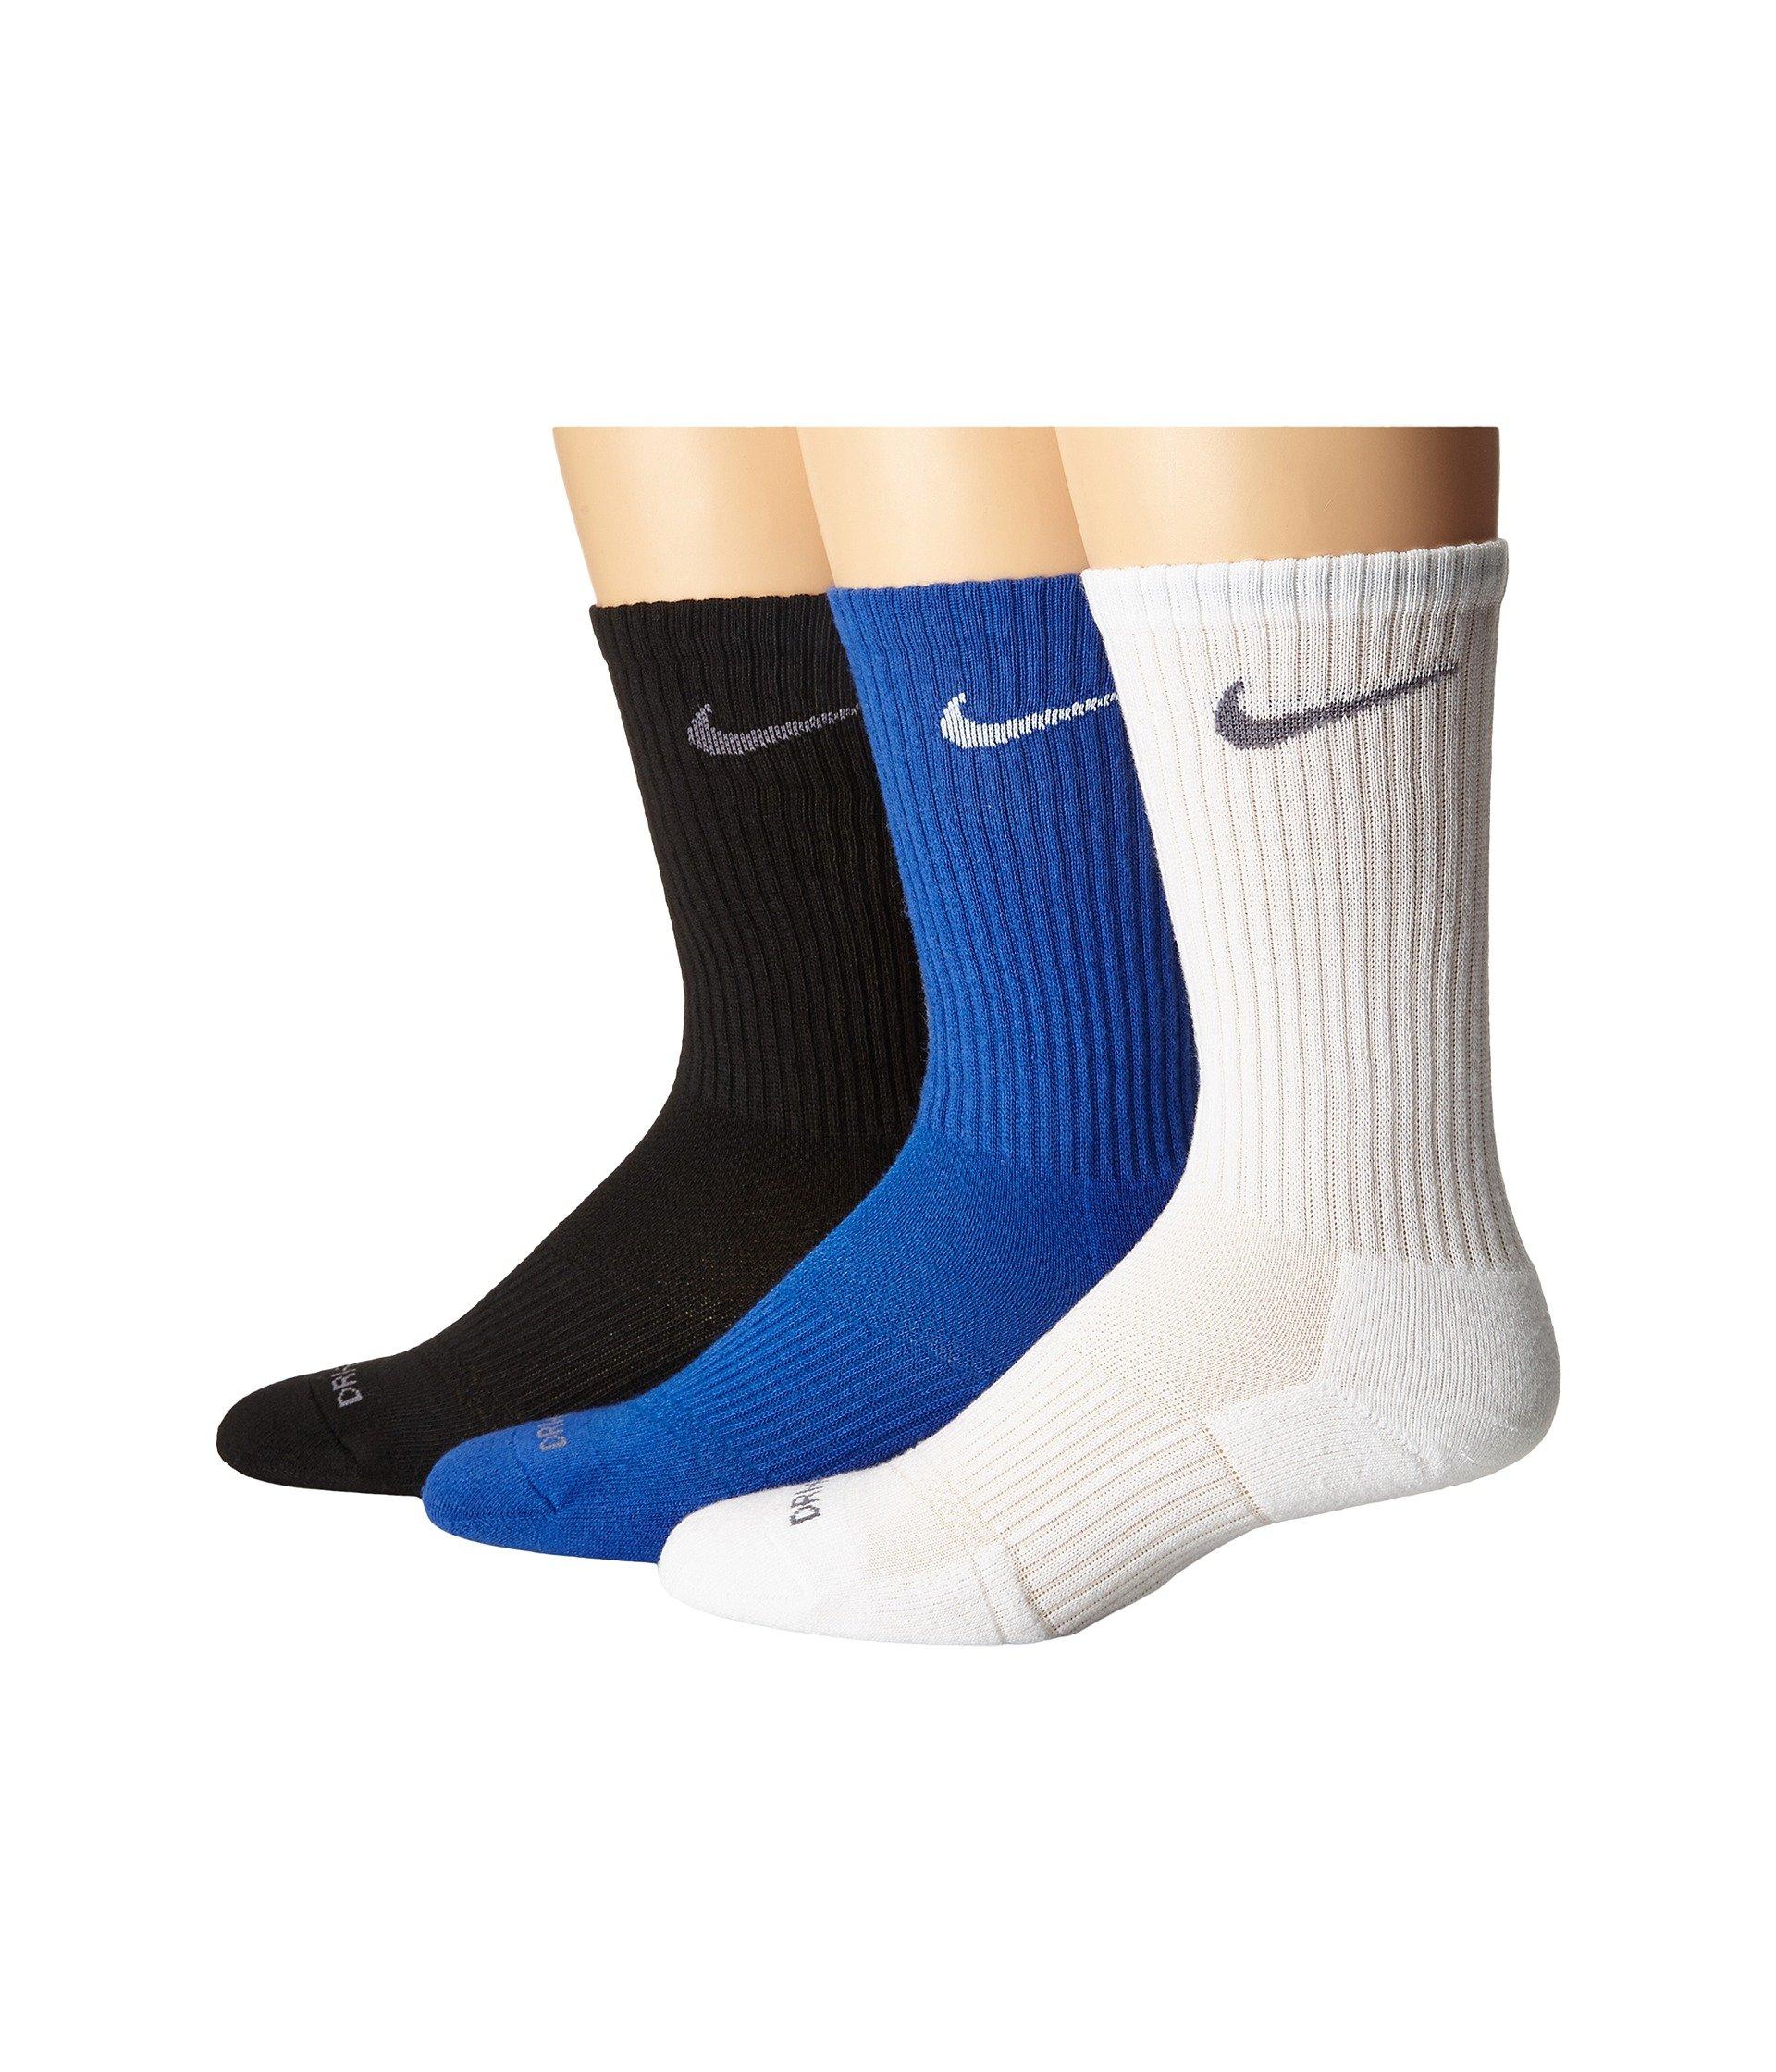 Nike Grey white Pack 3 flint flint Game Dri Crew Cushion Royal Pair Grey white fit black 7r7Uq